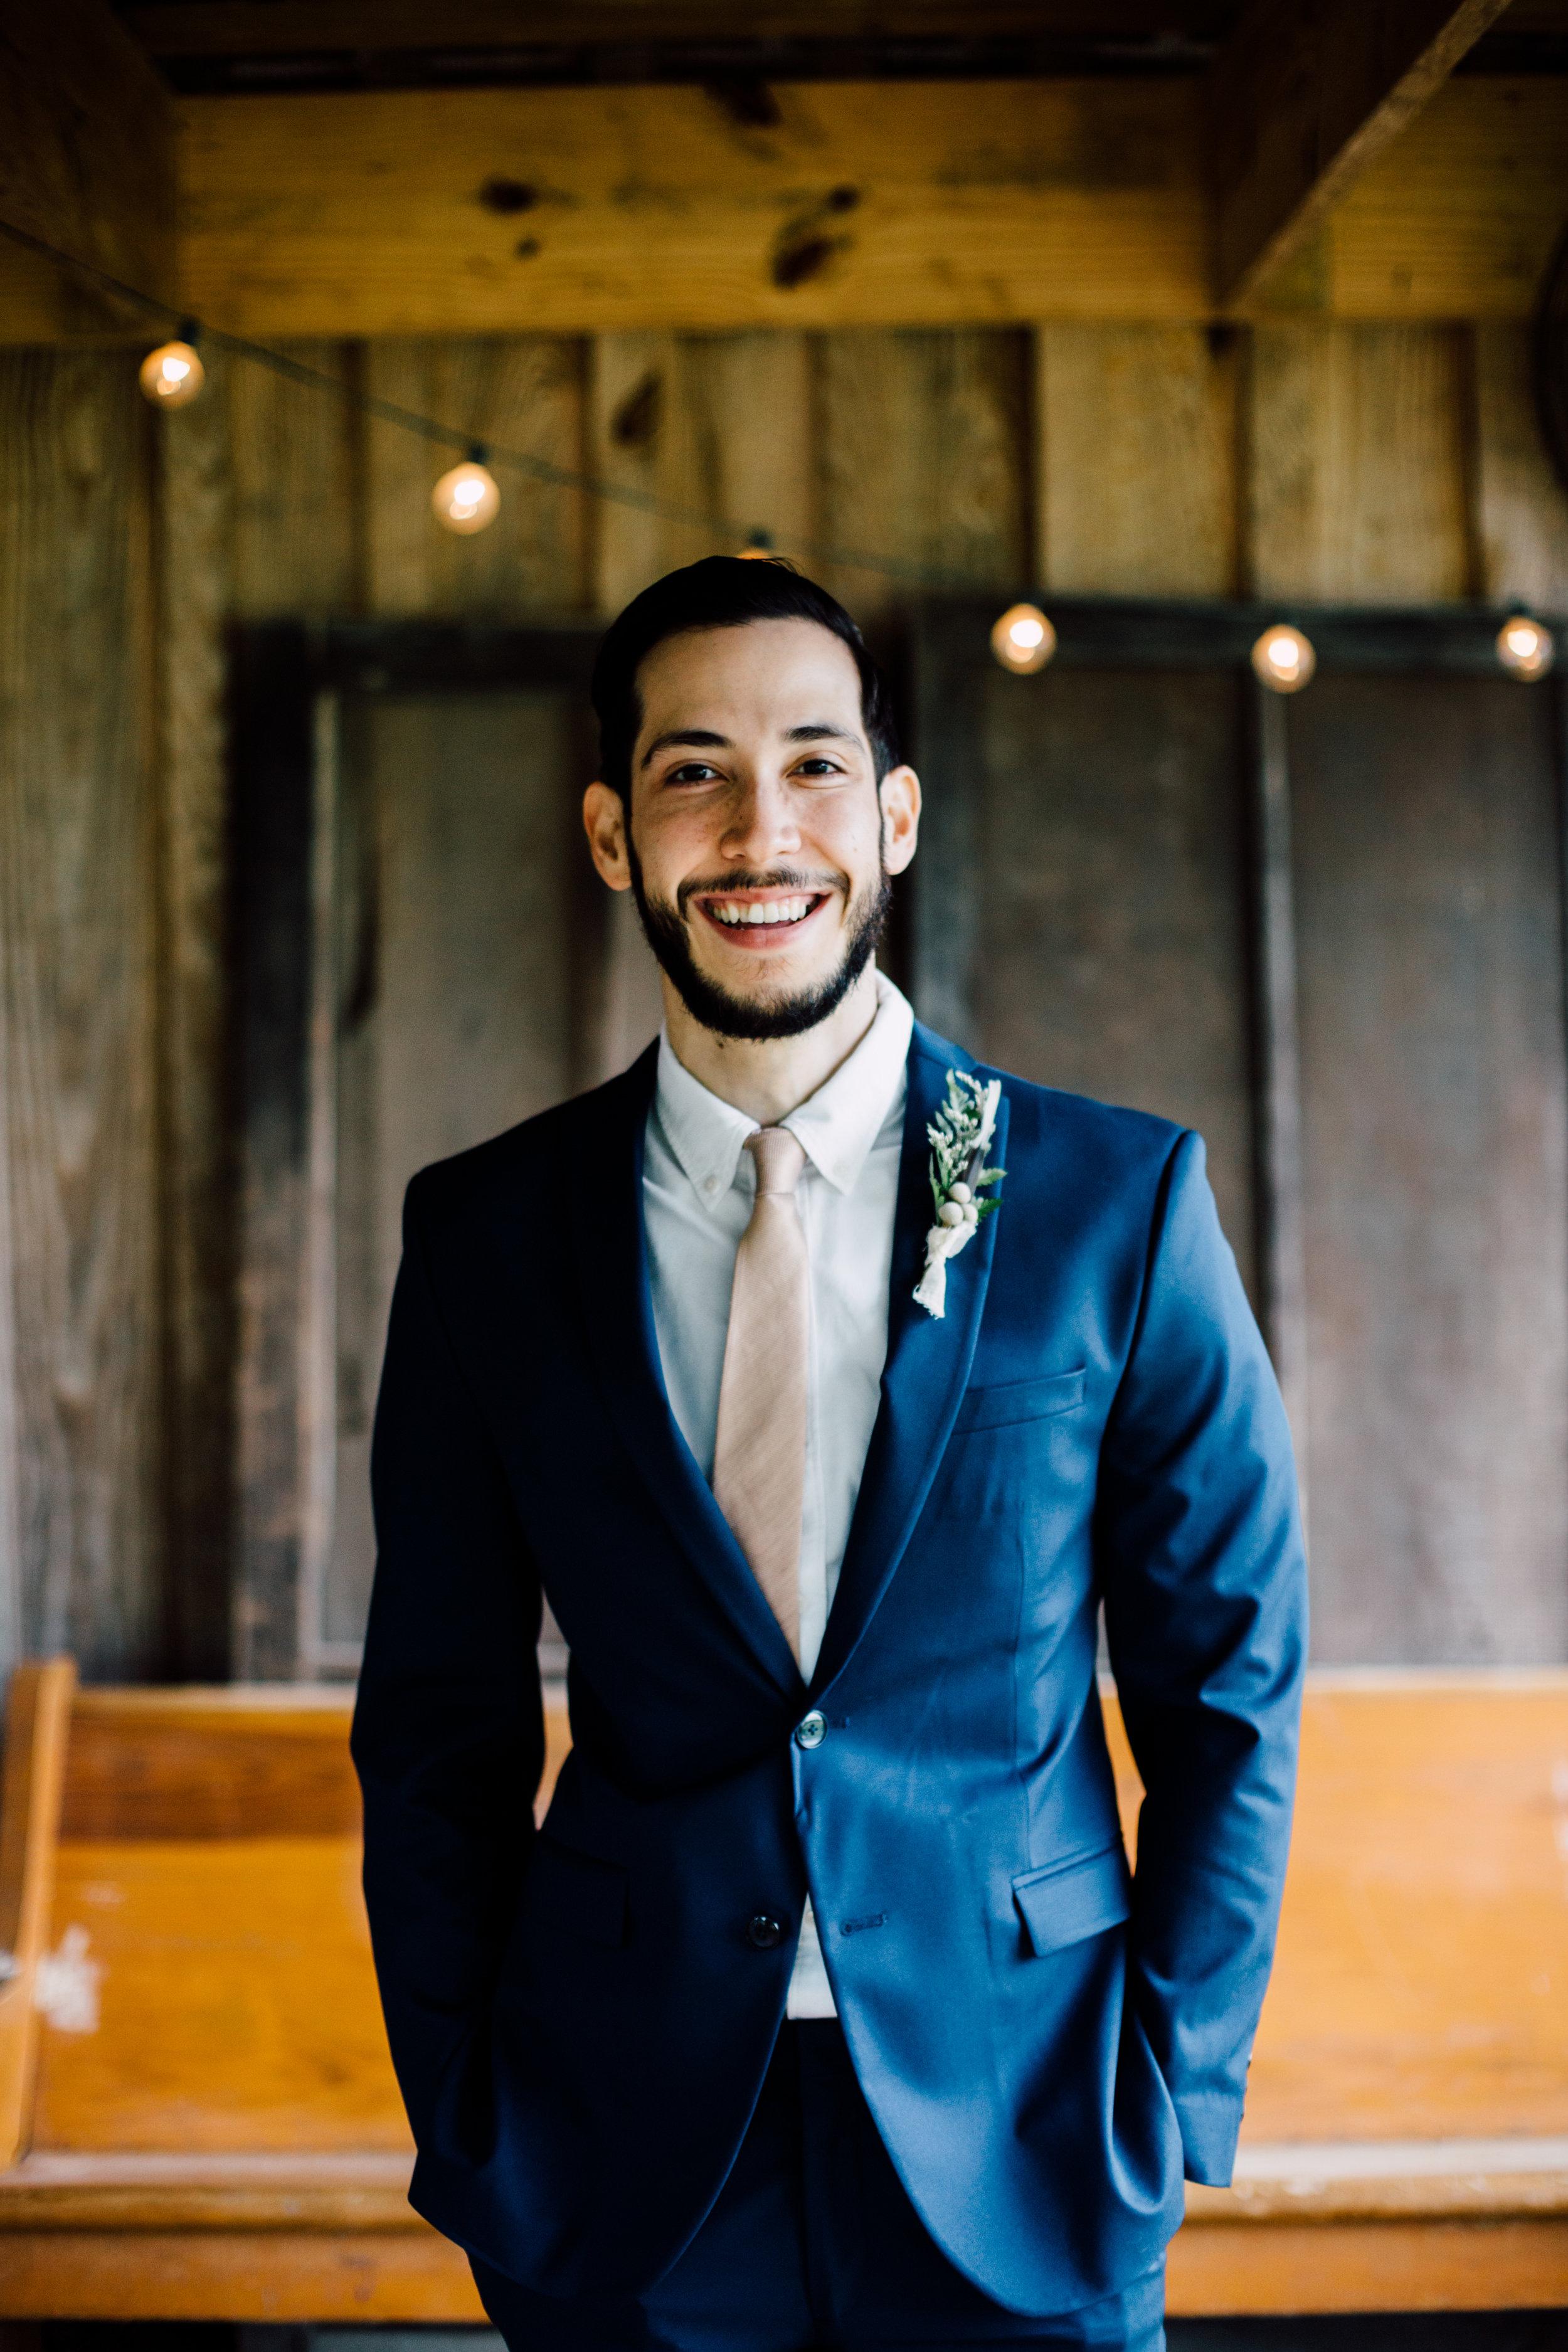 smiling groom zara navy blue suit